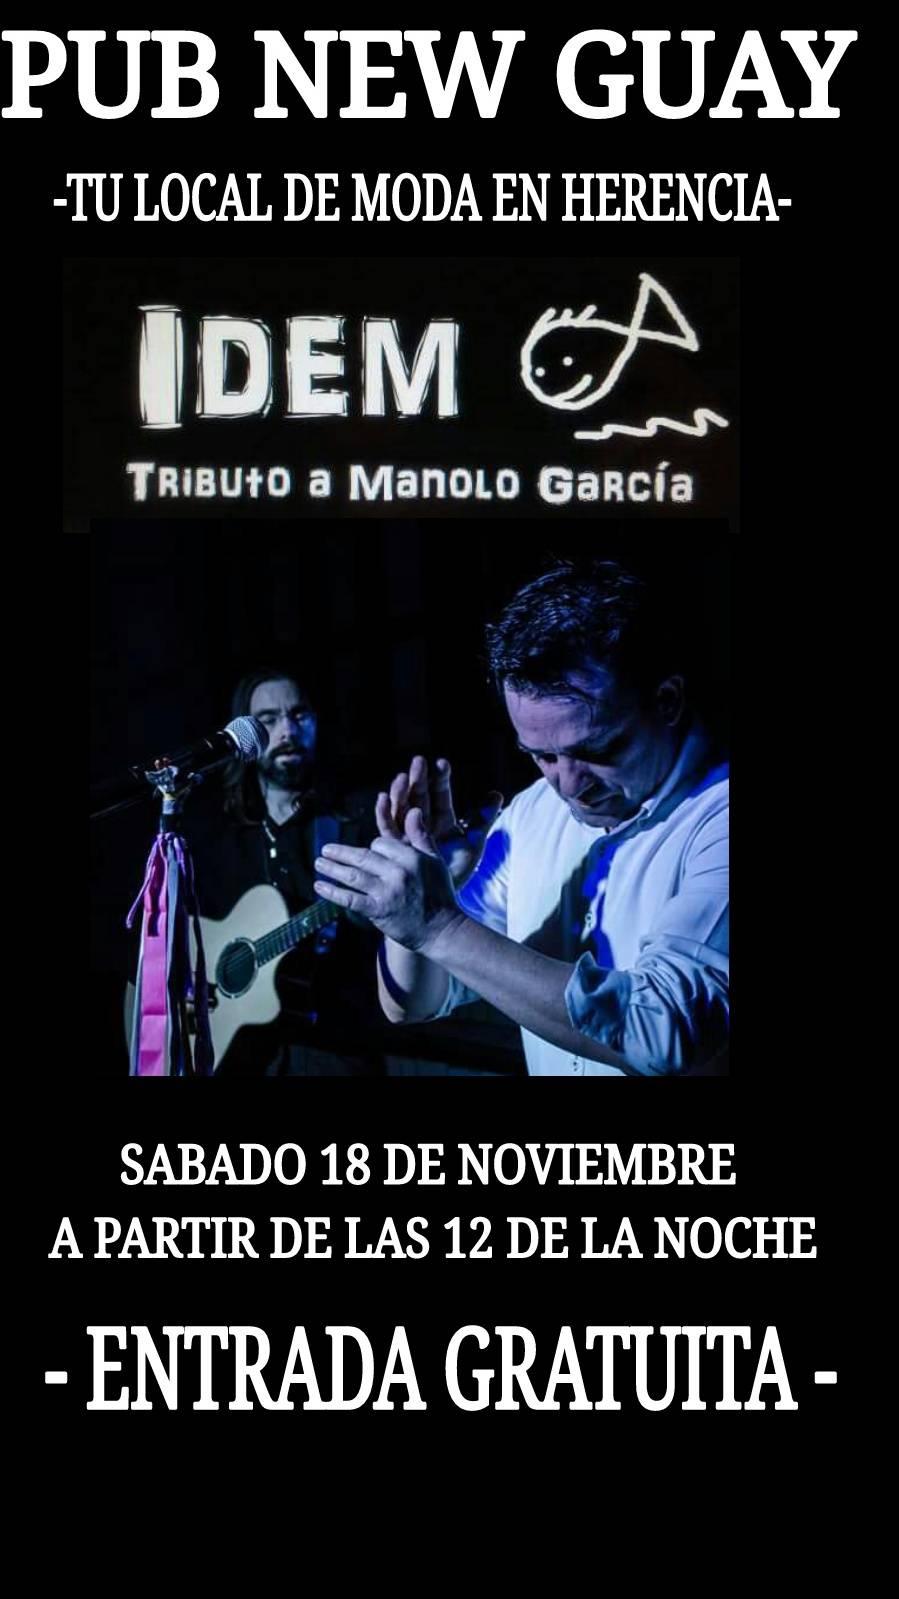 IDEM tributo a Manolo Garc%C3%ADa - Tributo a Manolo García el disco-pub New Guay